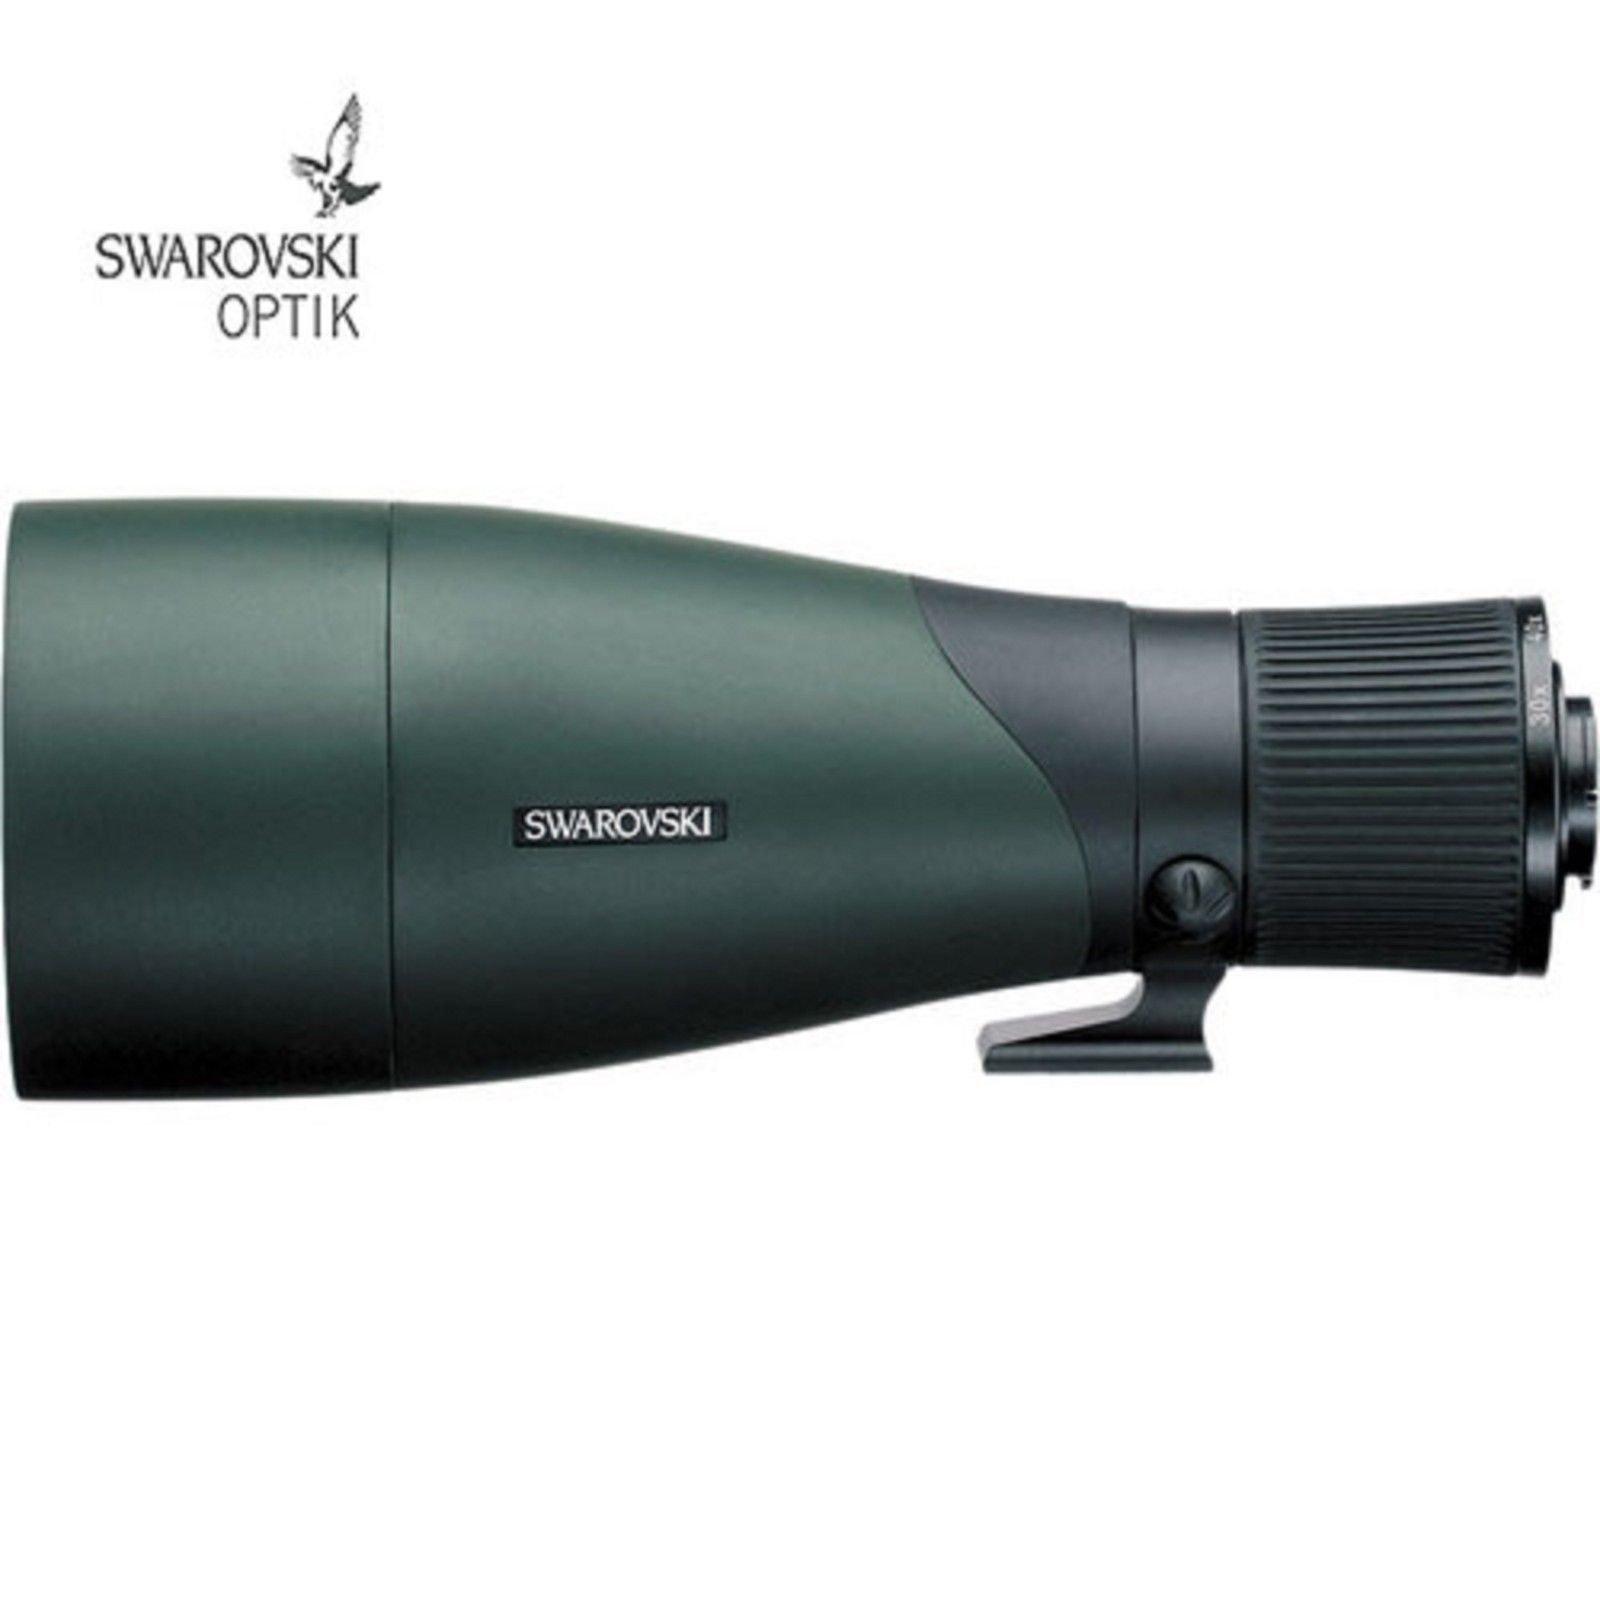 Swarovski Atx/stx 95mm Modular Objective Lens